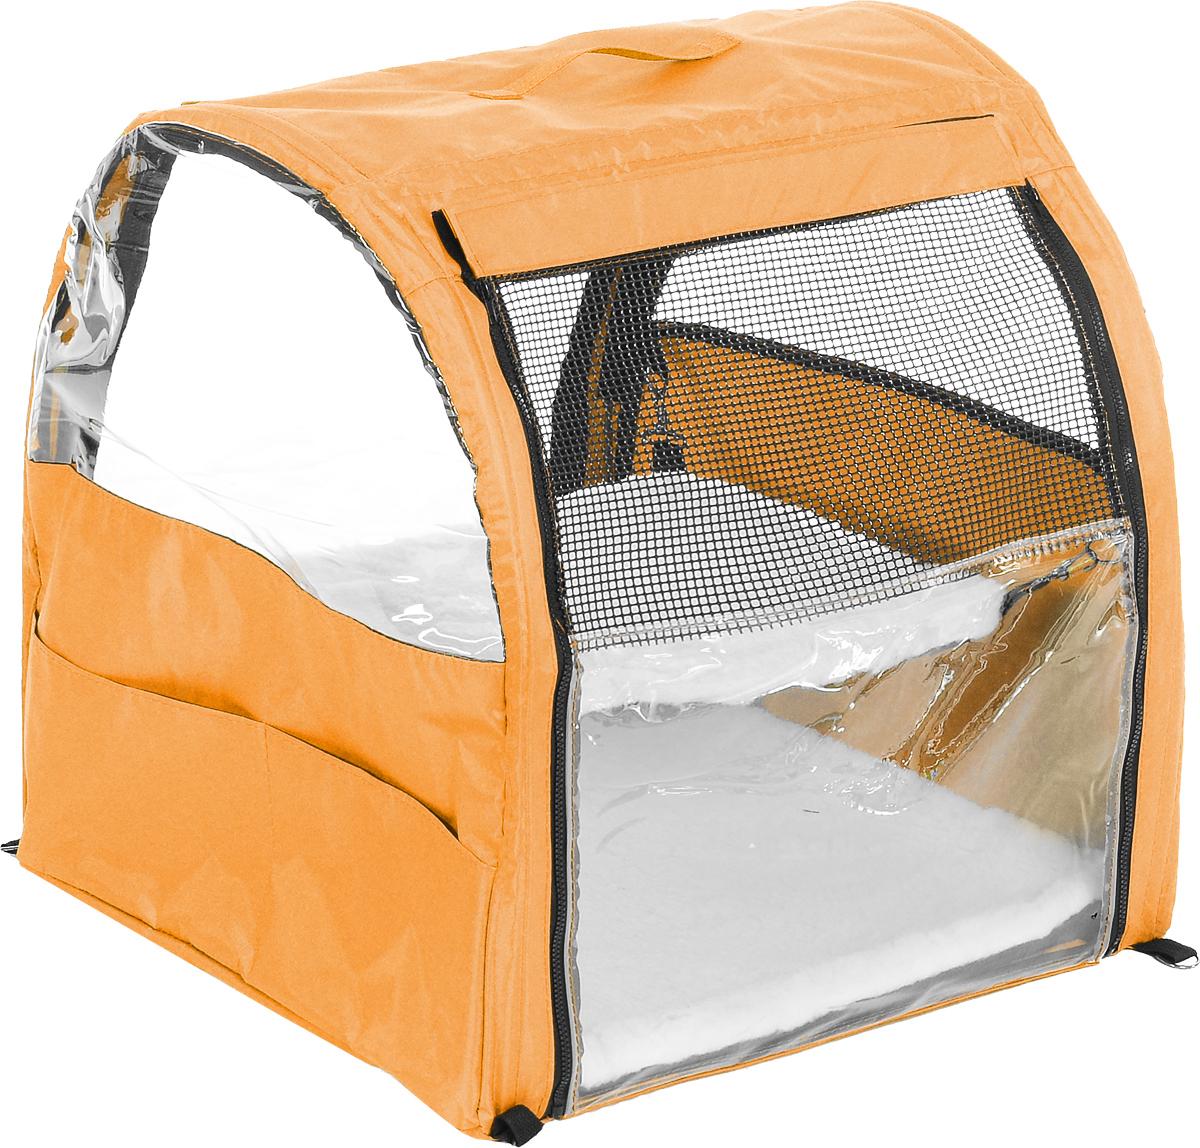 "Клетка для животных ""Заря-Плюс"", выставочная, цвет: оранжевый, черный, 51 х 58 х 55 см КВП1о"